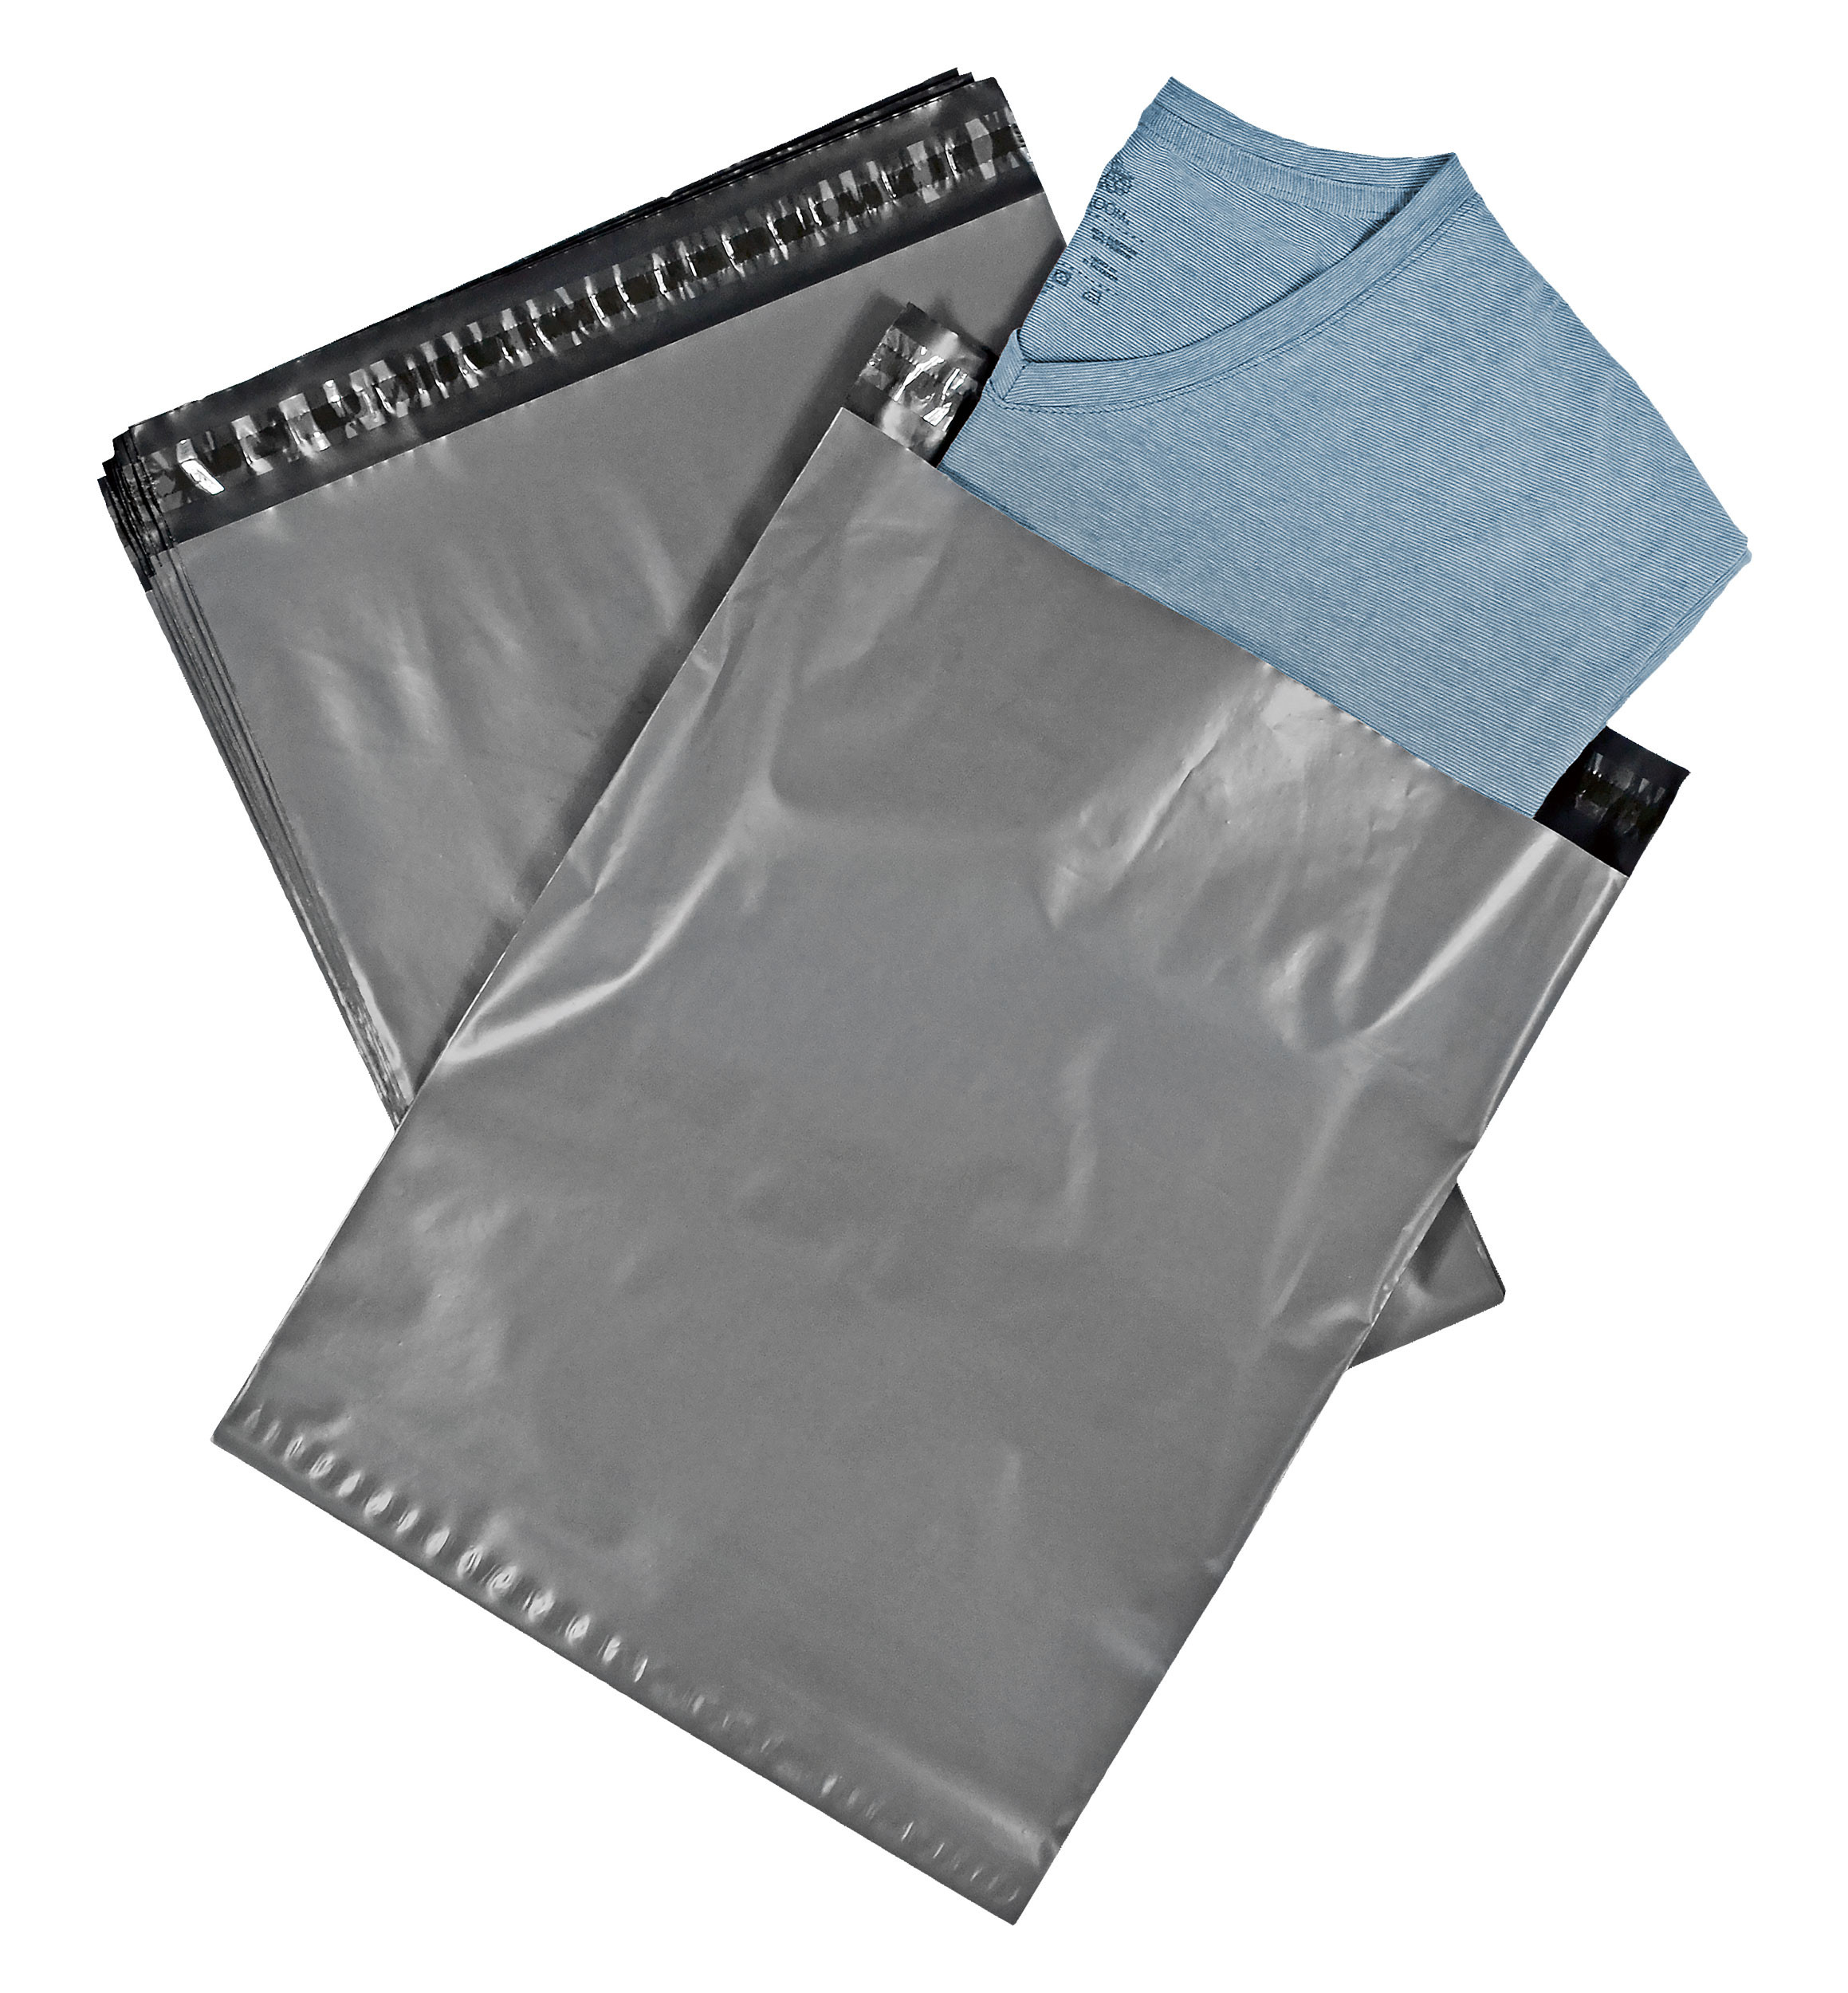 12x15.5 Poly Mailers Envelopes Self Sealing Bags - 2.4 Mil, Set of 100